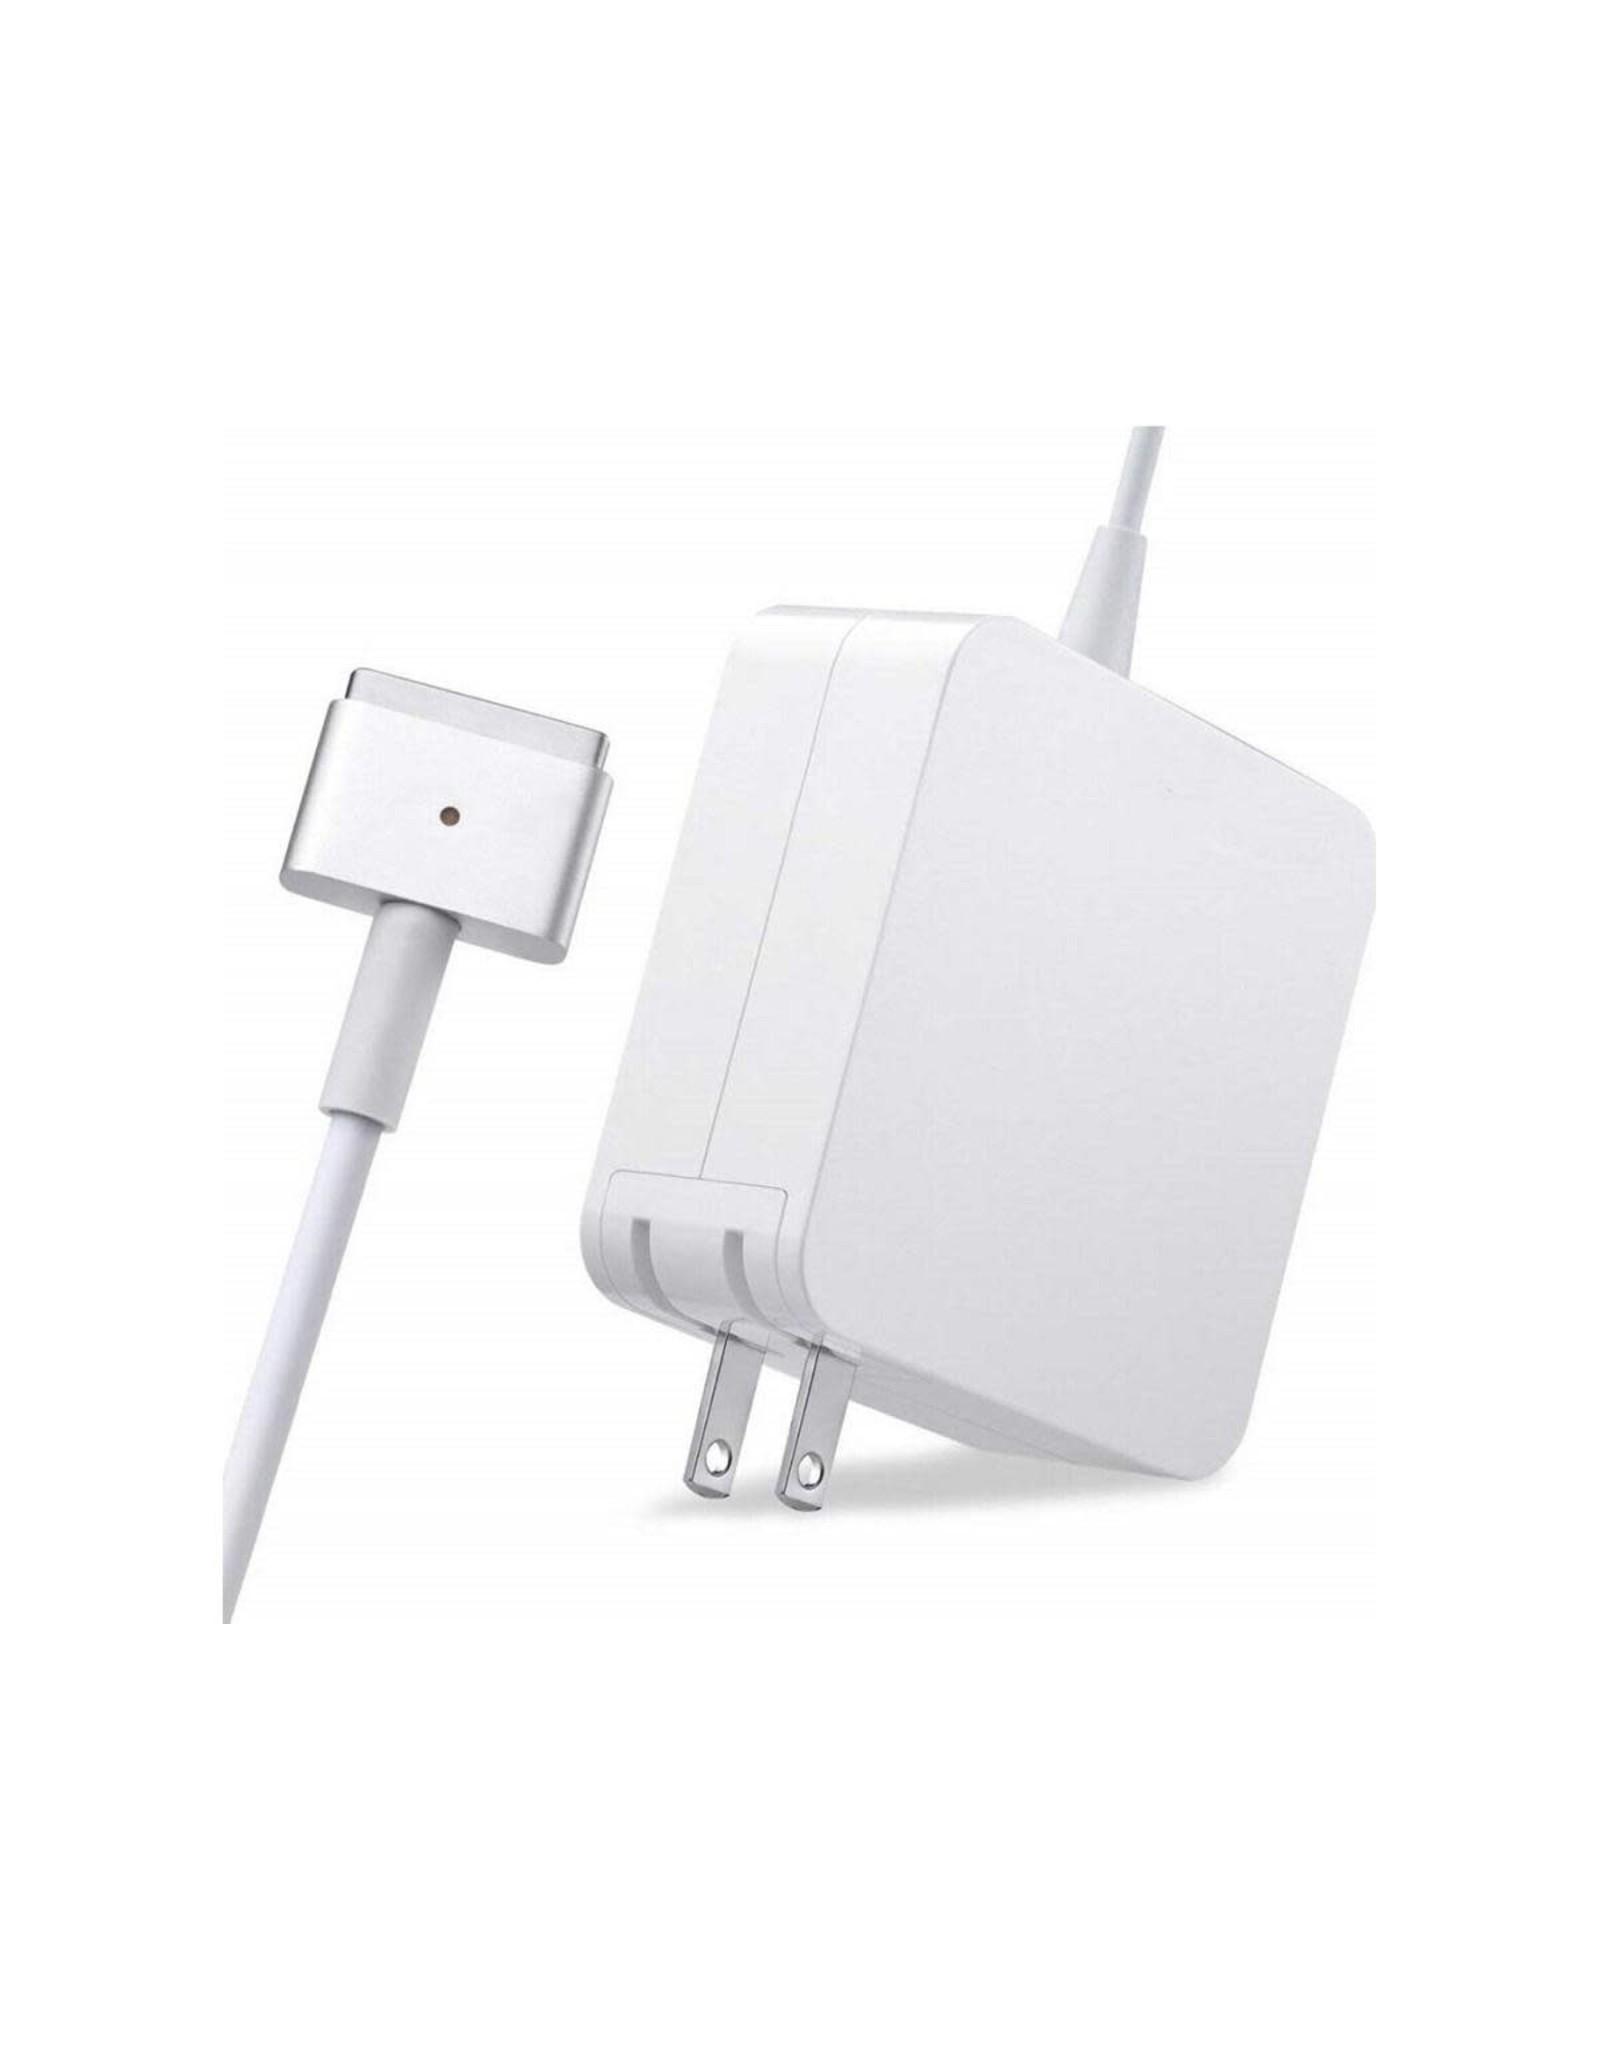 Axiom Axiom, 85-Watt MagSafe 2 Power Adapter for Apple